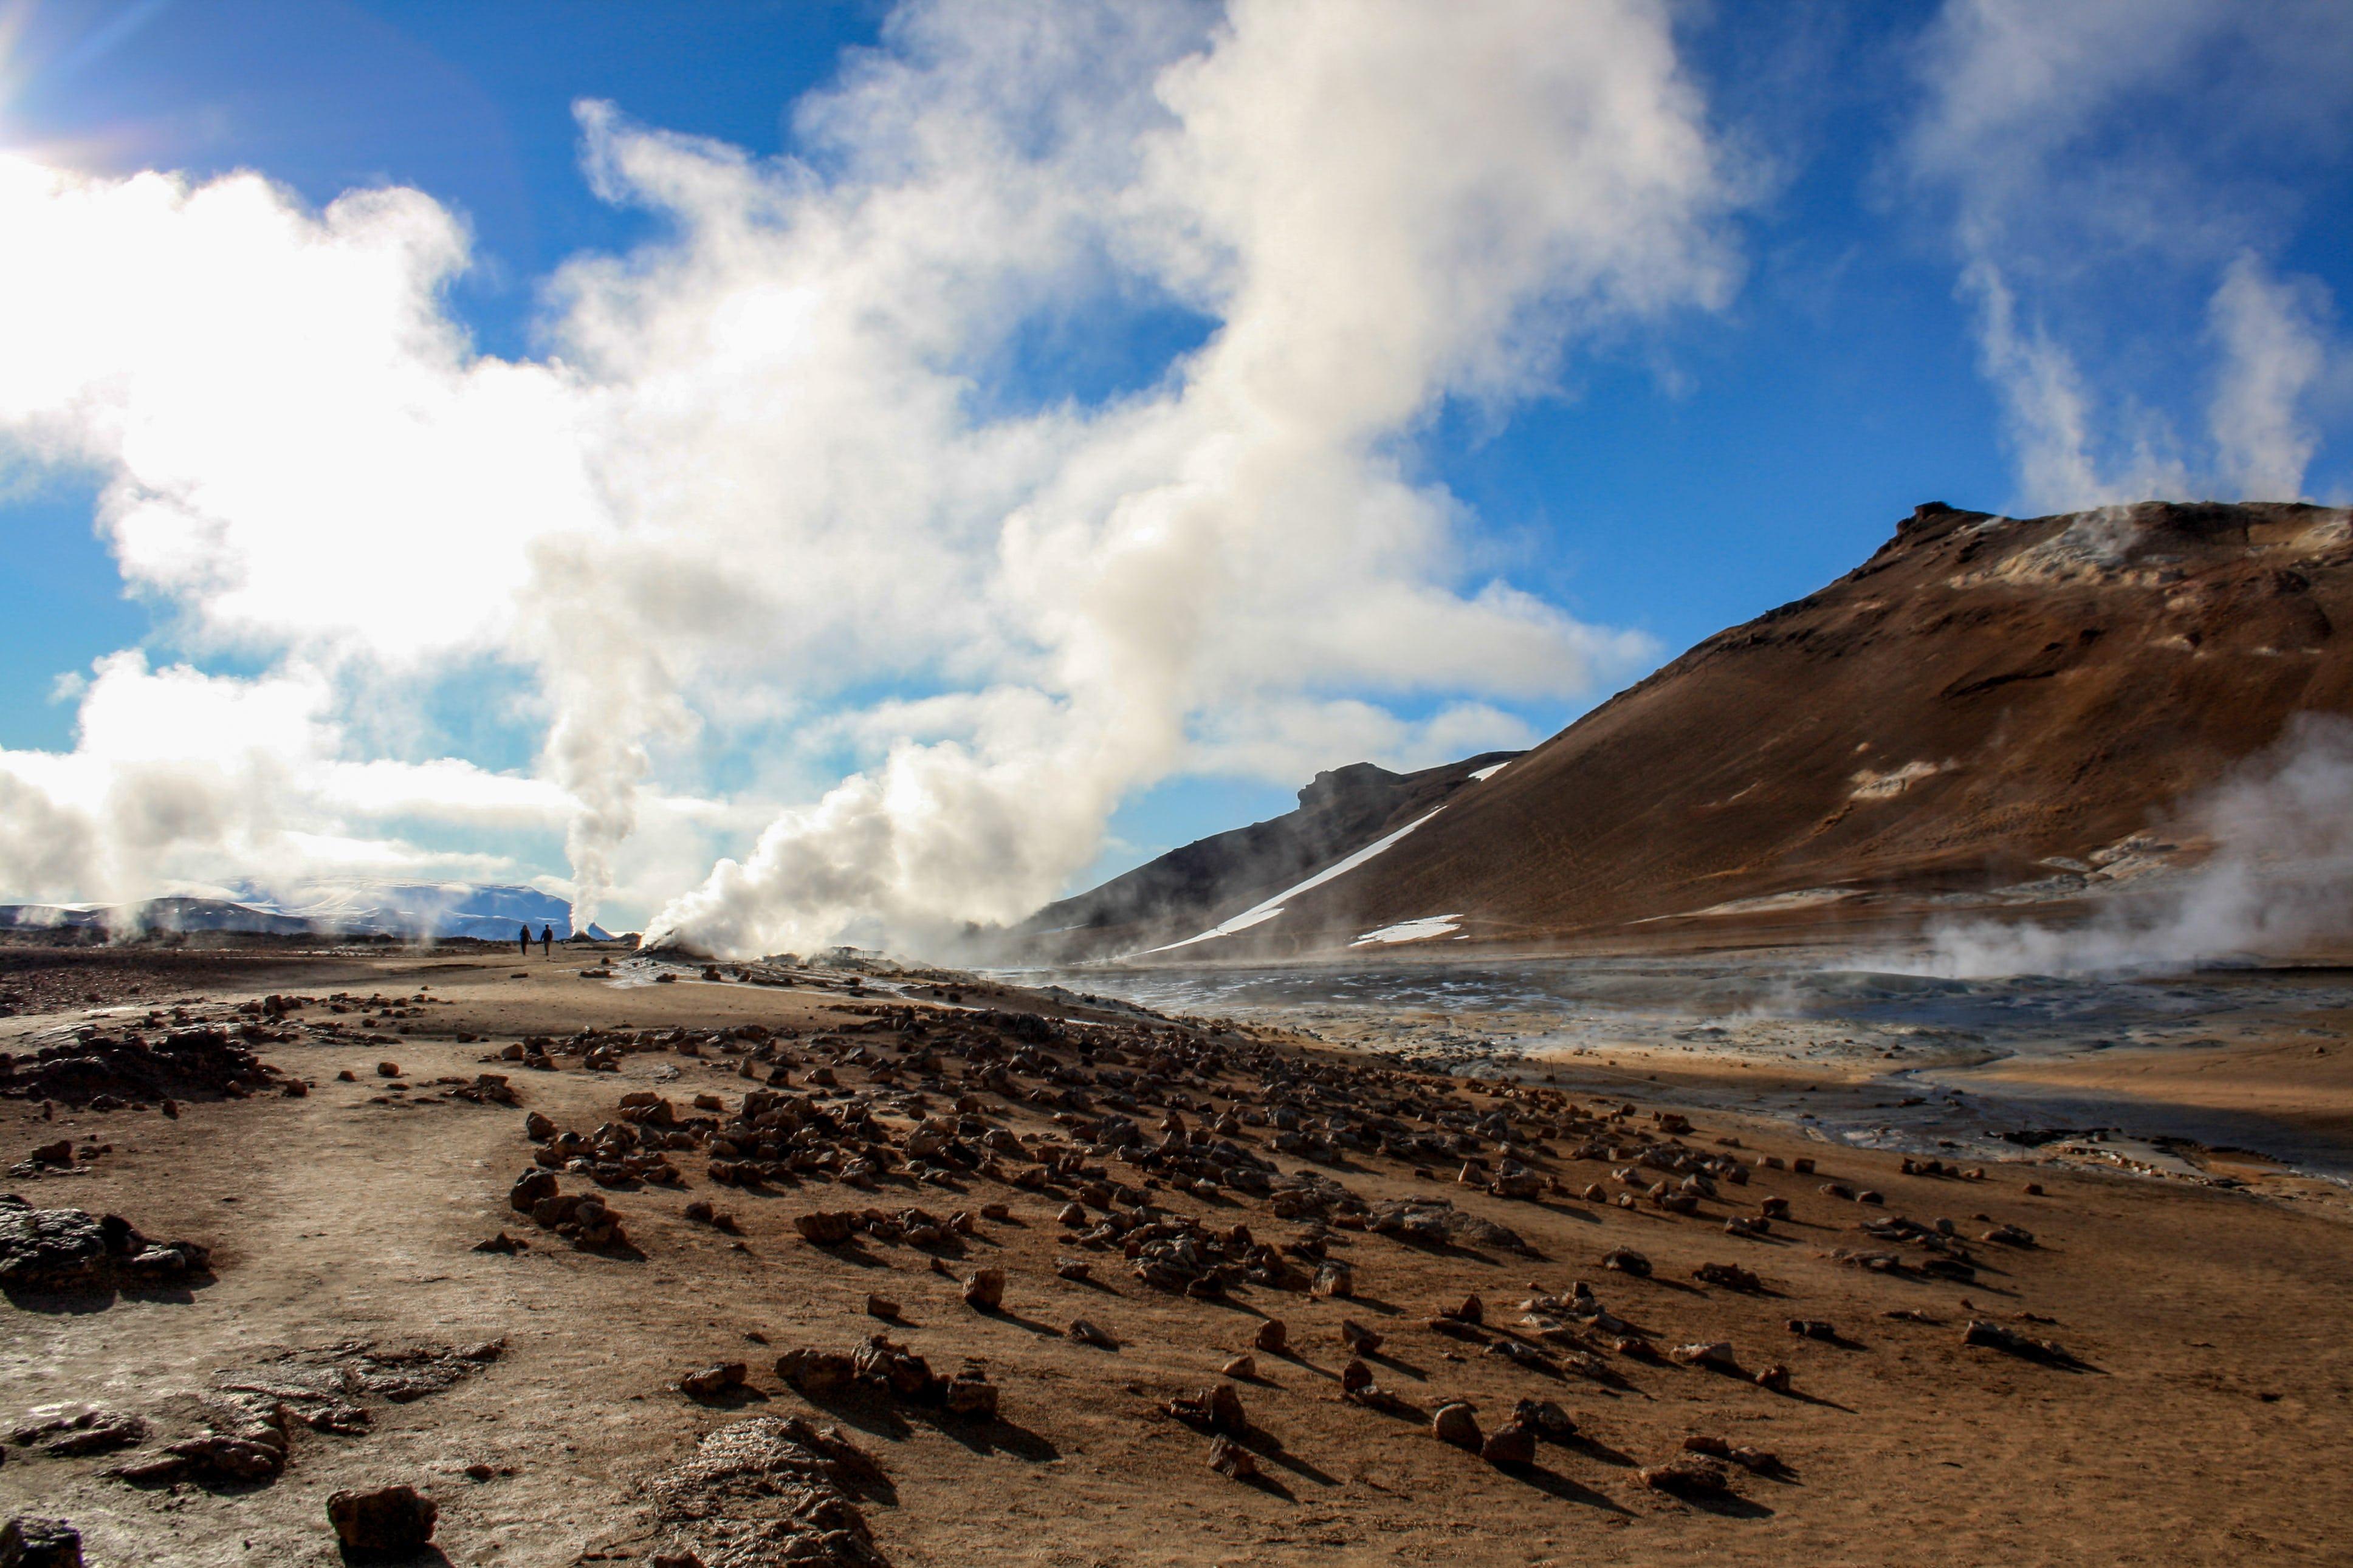 L'area geotermica di Námaskard sembra provenire da un altro pianeta.